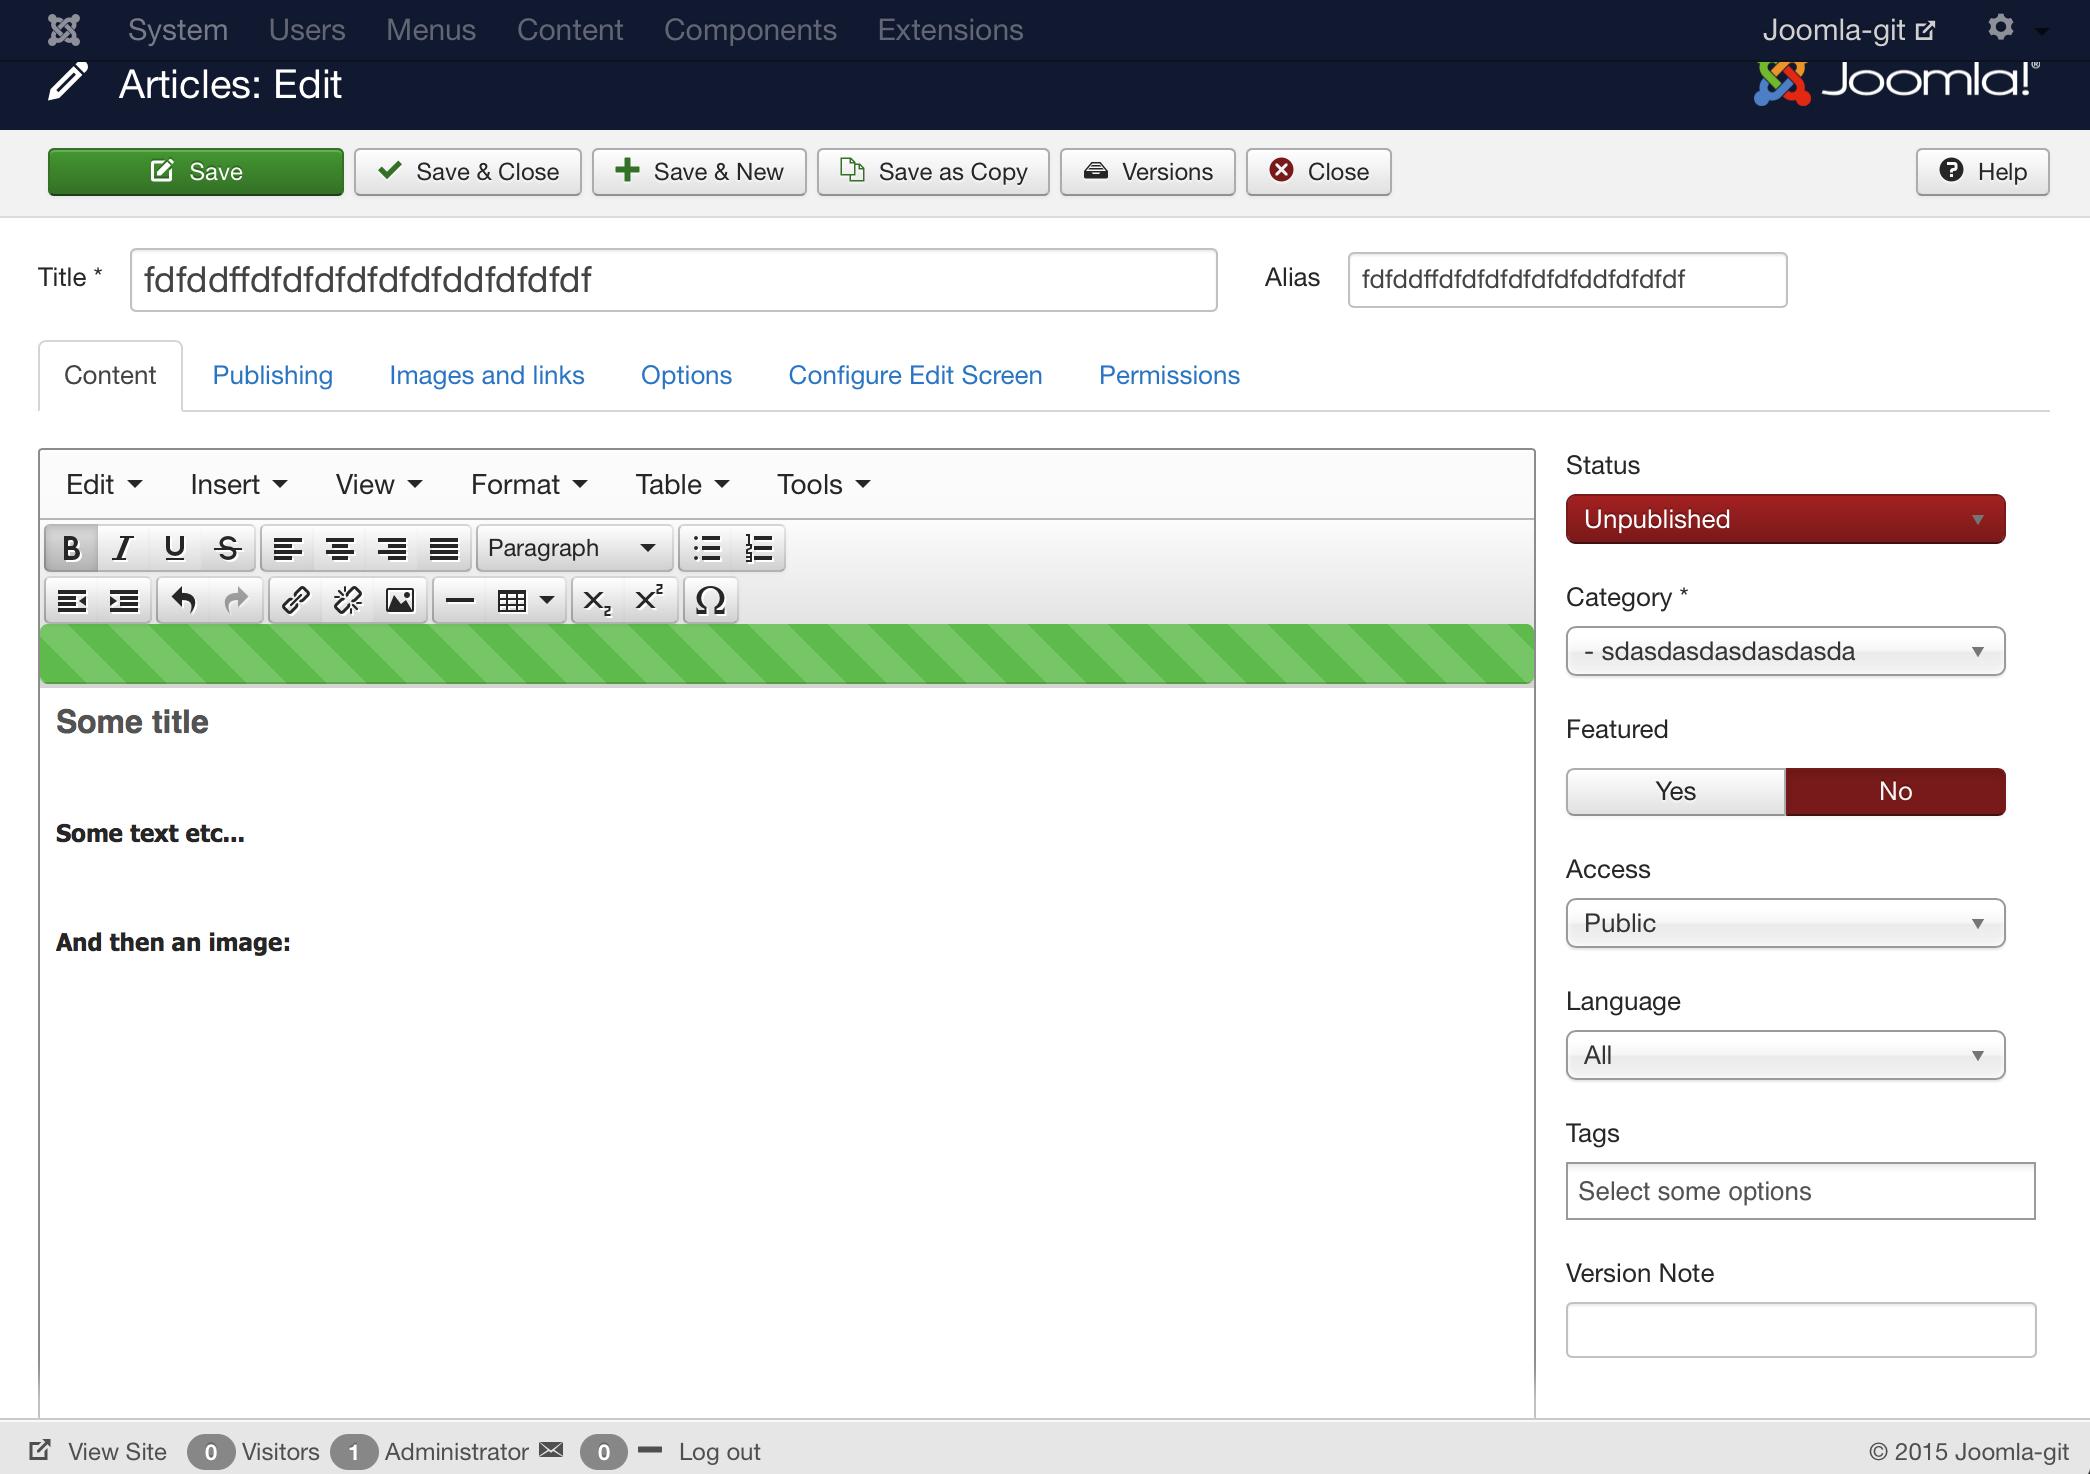 screenshot 2015-10-25 02 14 10